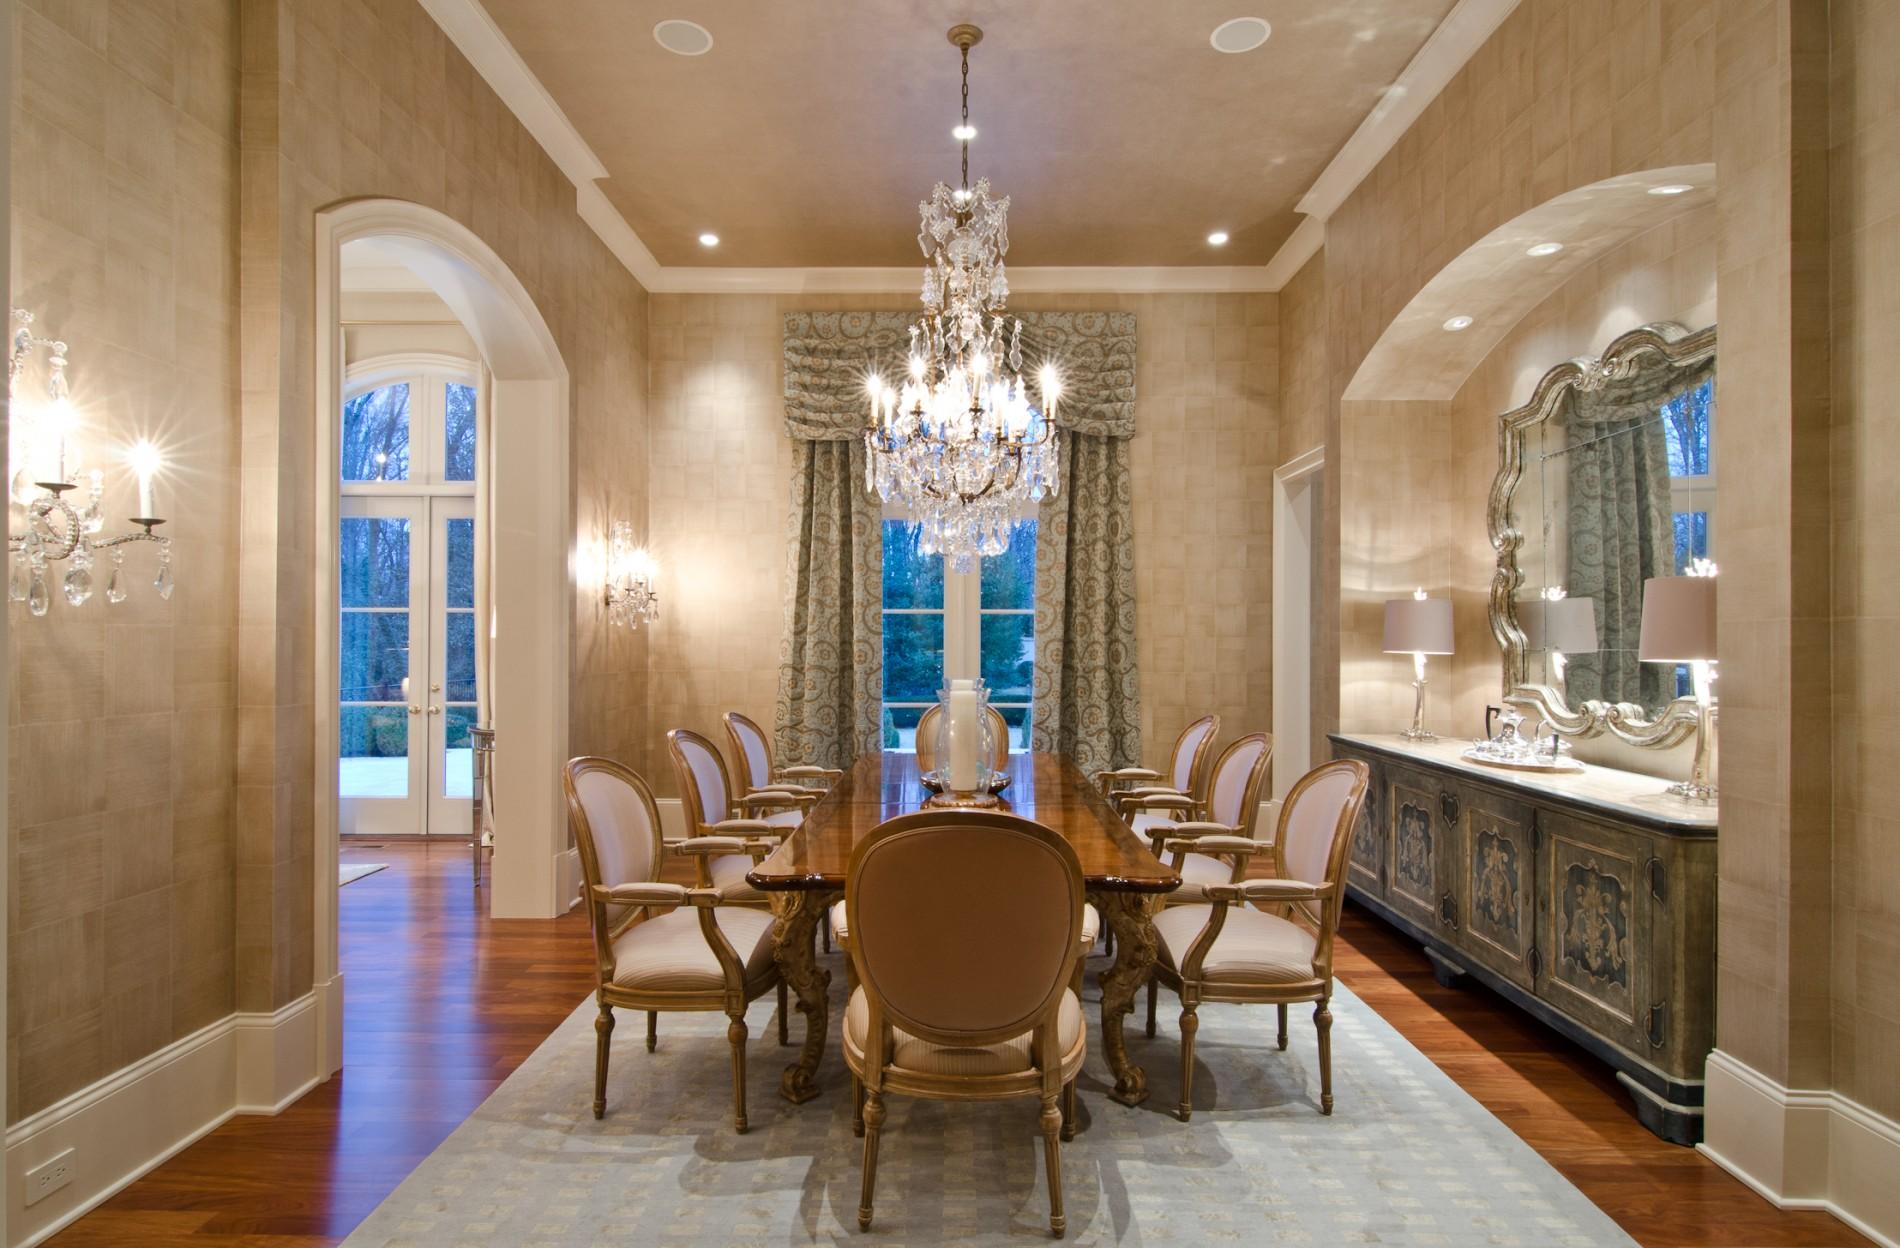 custom-large-dinging-room-crystal-chandelier.jpg